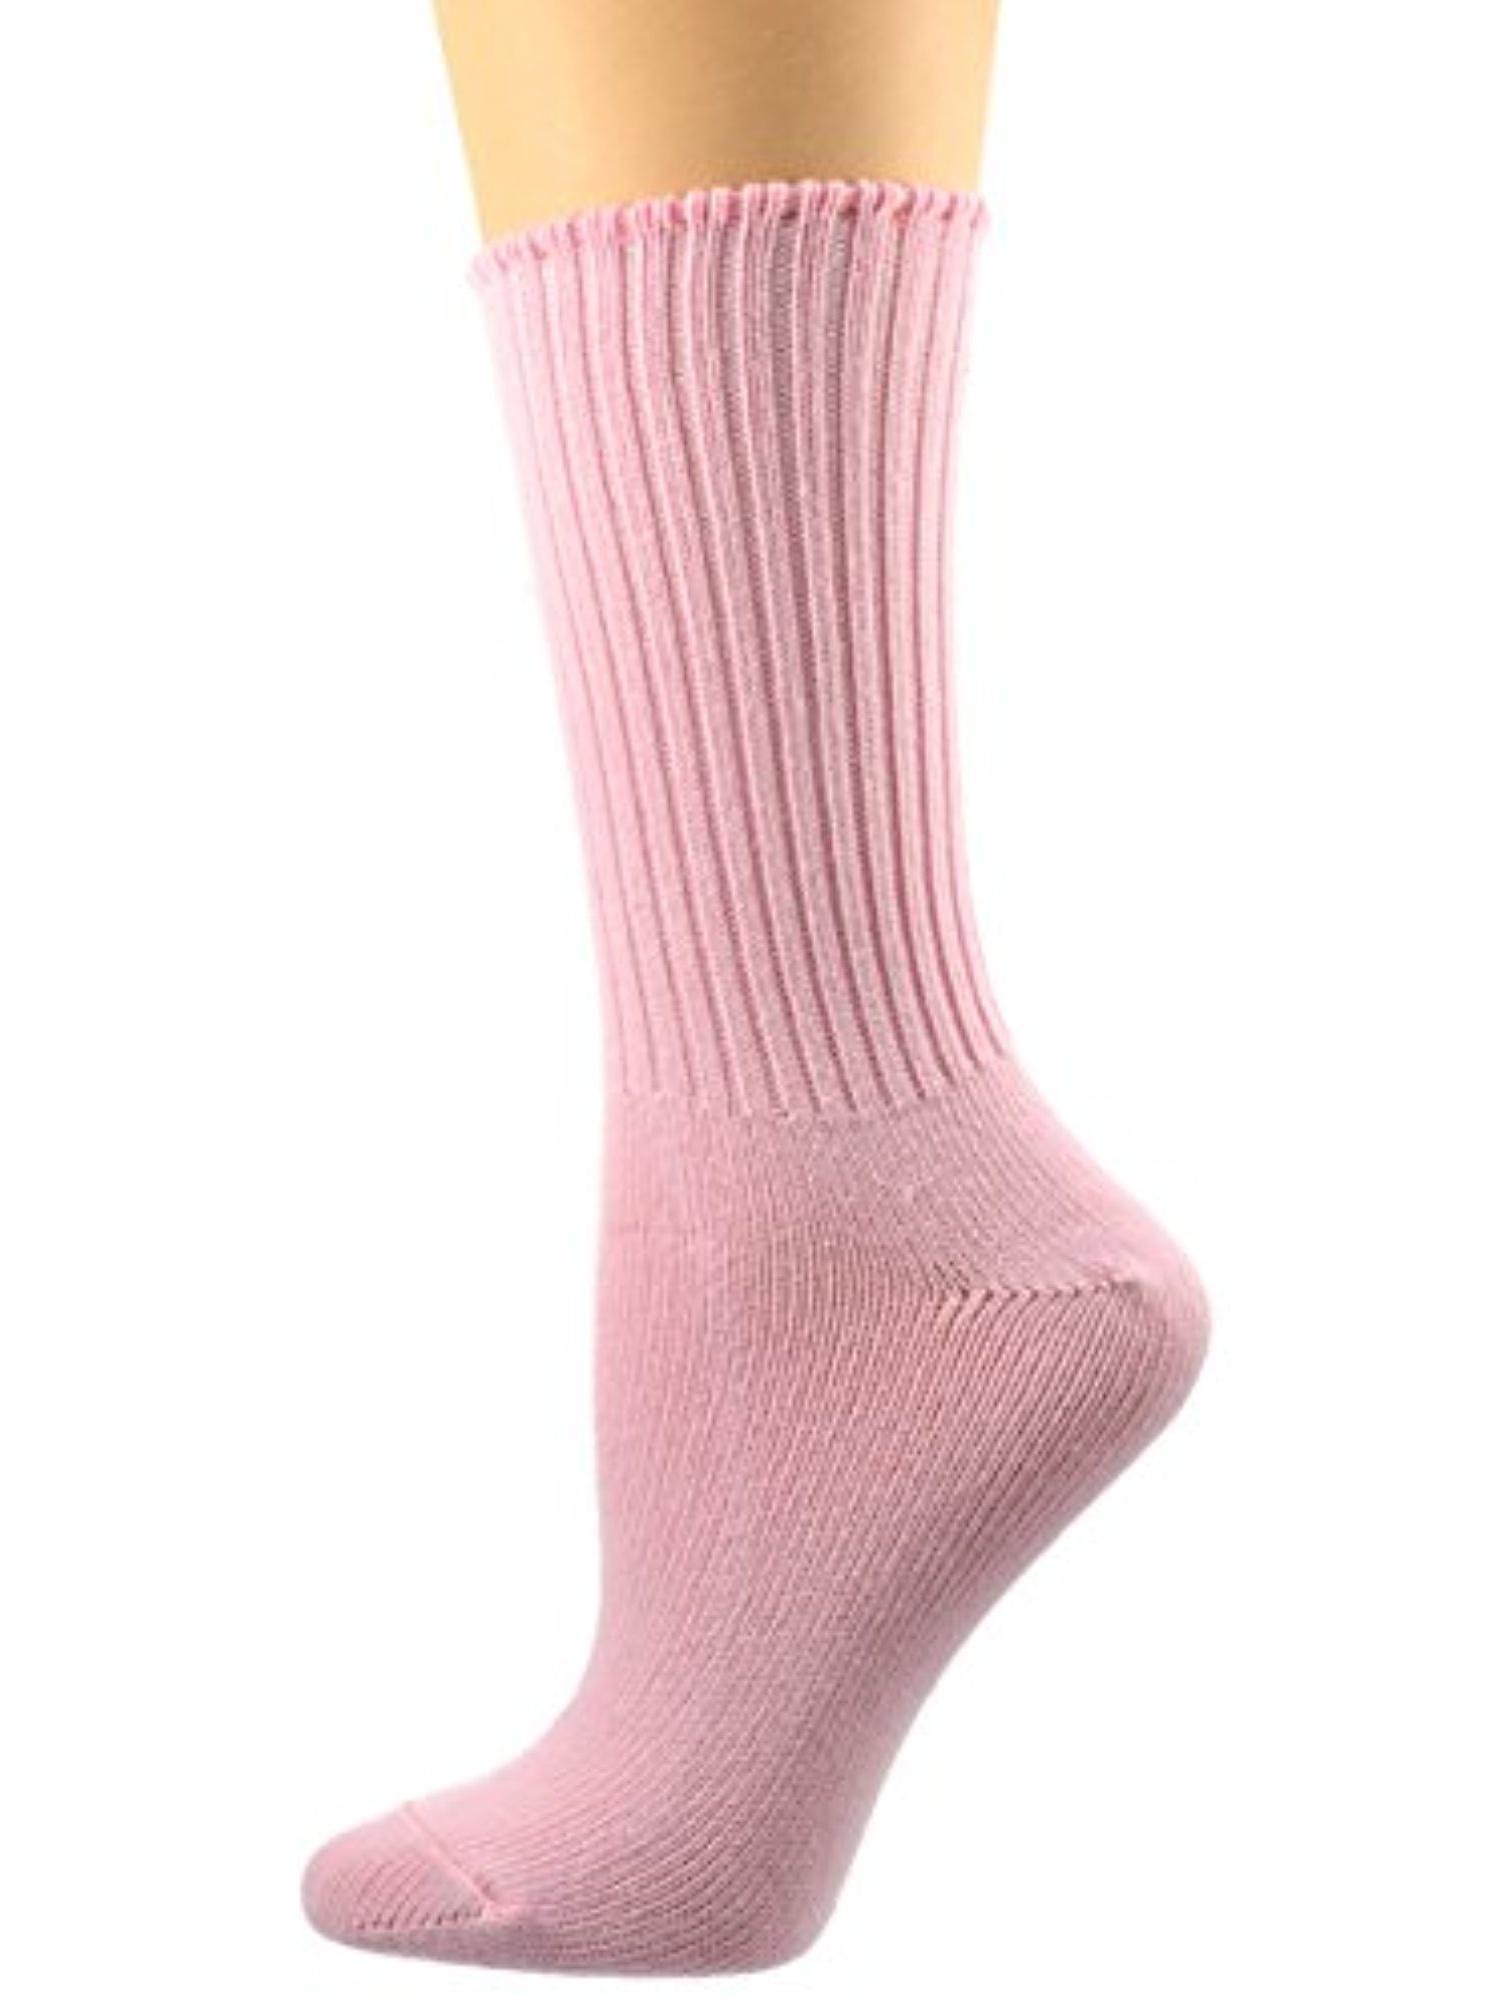 Sierra Socks Women's Organic Cotton Seamless Toe Crew 3 Pair Pack (Fits Shoe Size 4-10 Socks Size 9-11, Black)